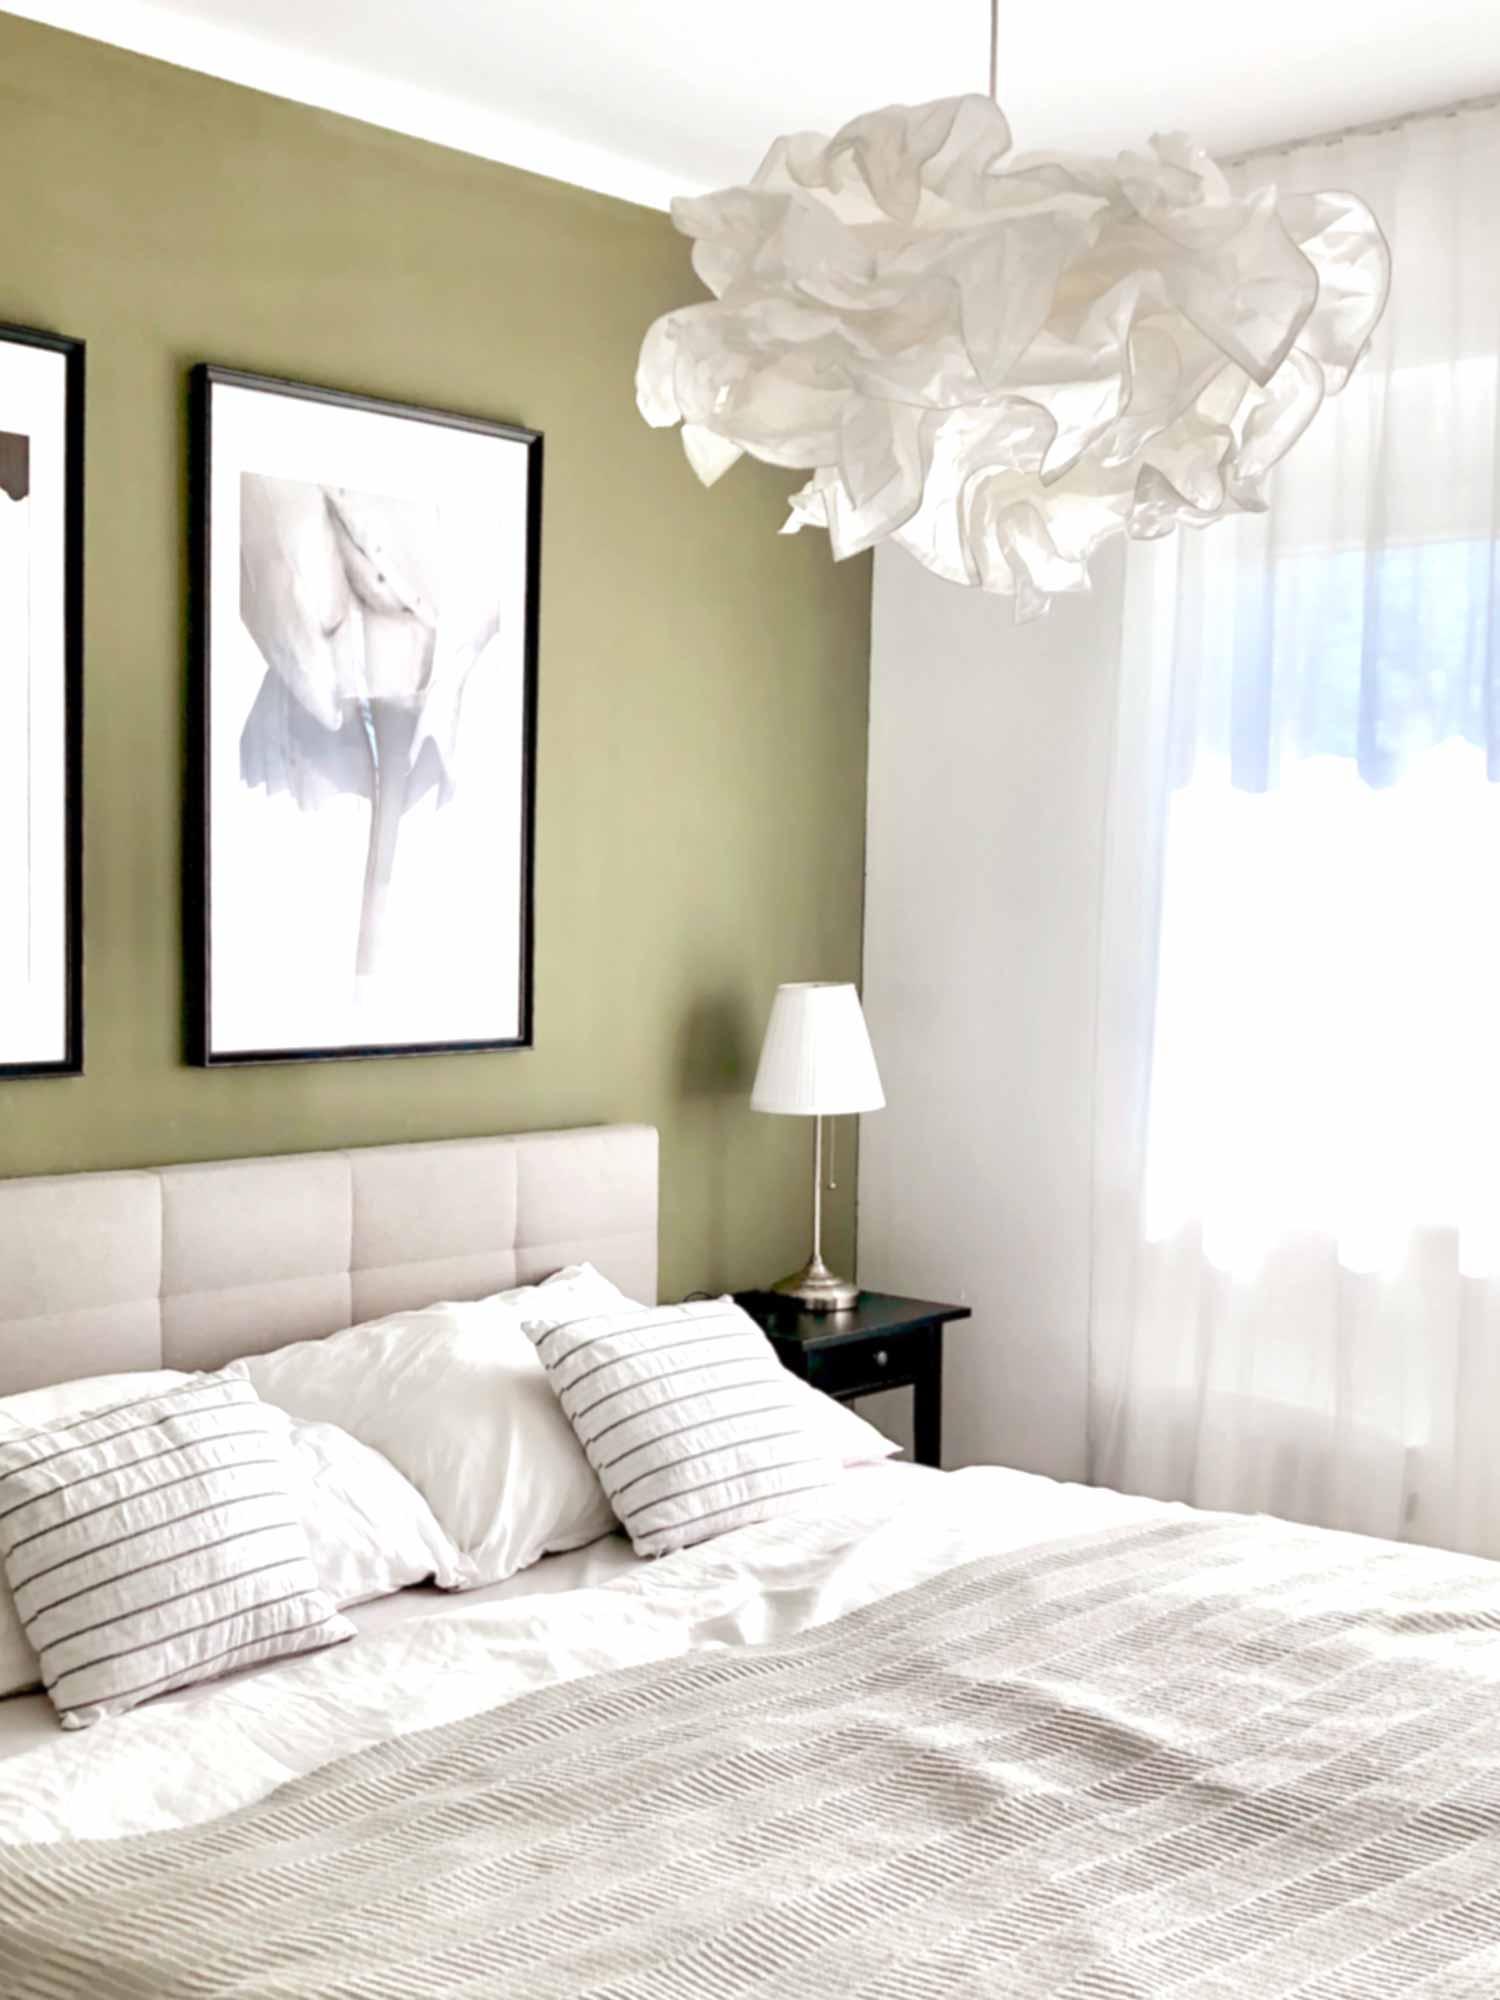 Raumumgestaltung | kontraste - interiordesign by anna